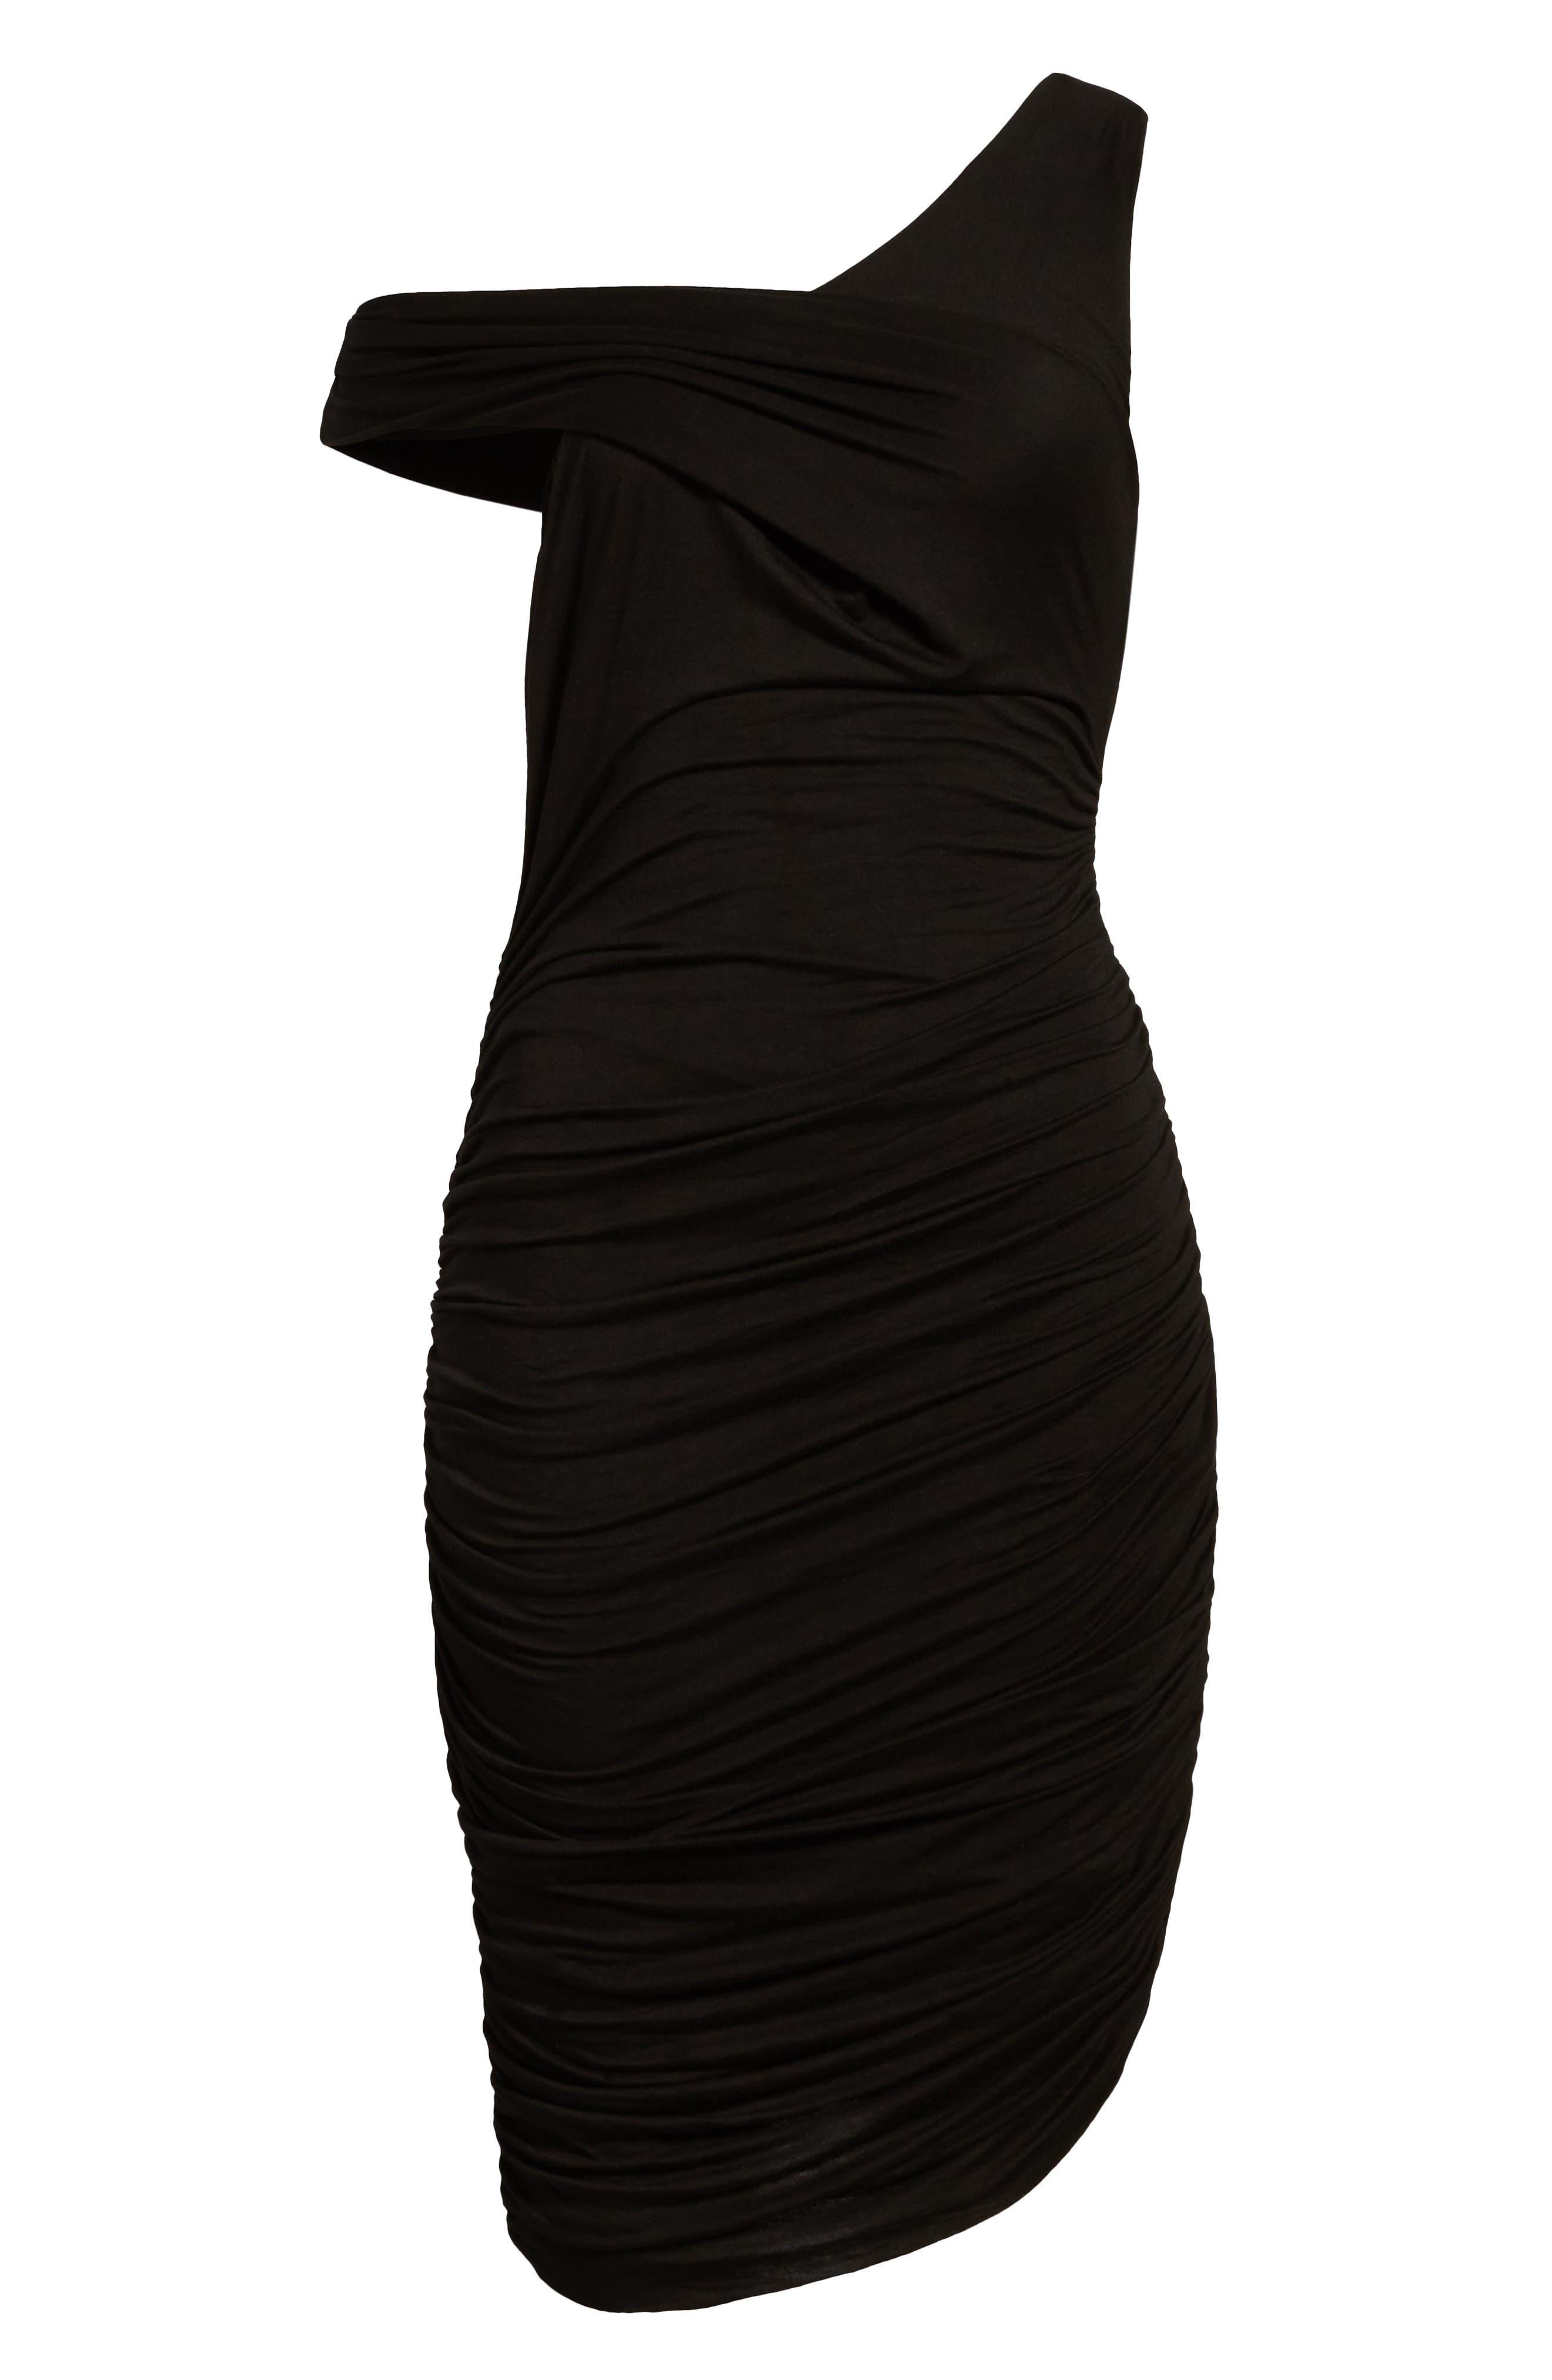 Ruched Sheath Dress,                             Alternate thumbnail 7, color,                             Black Multi